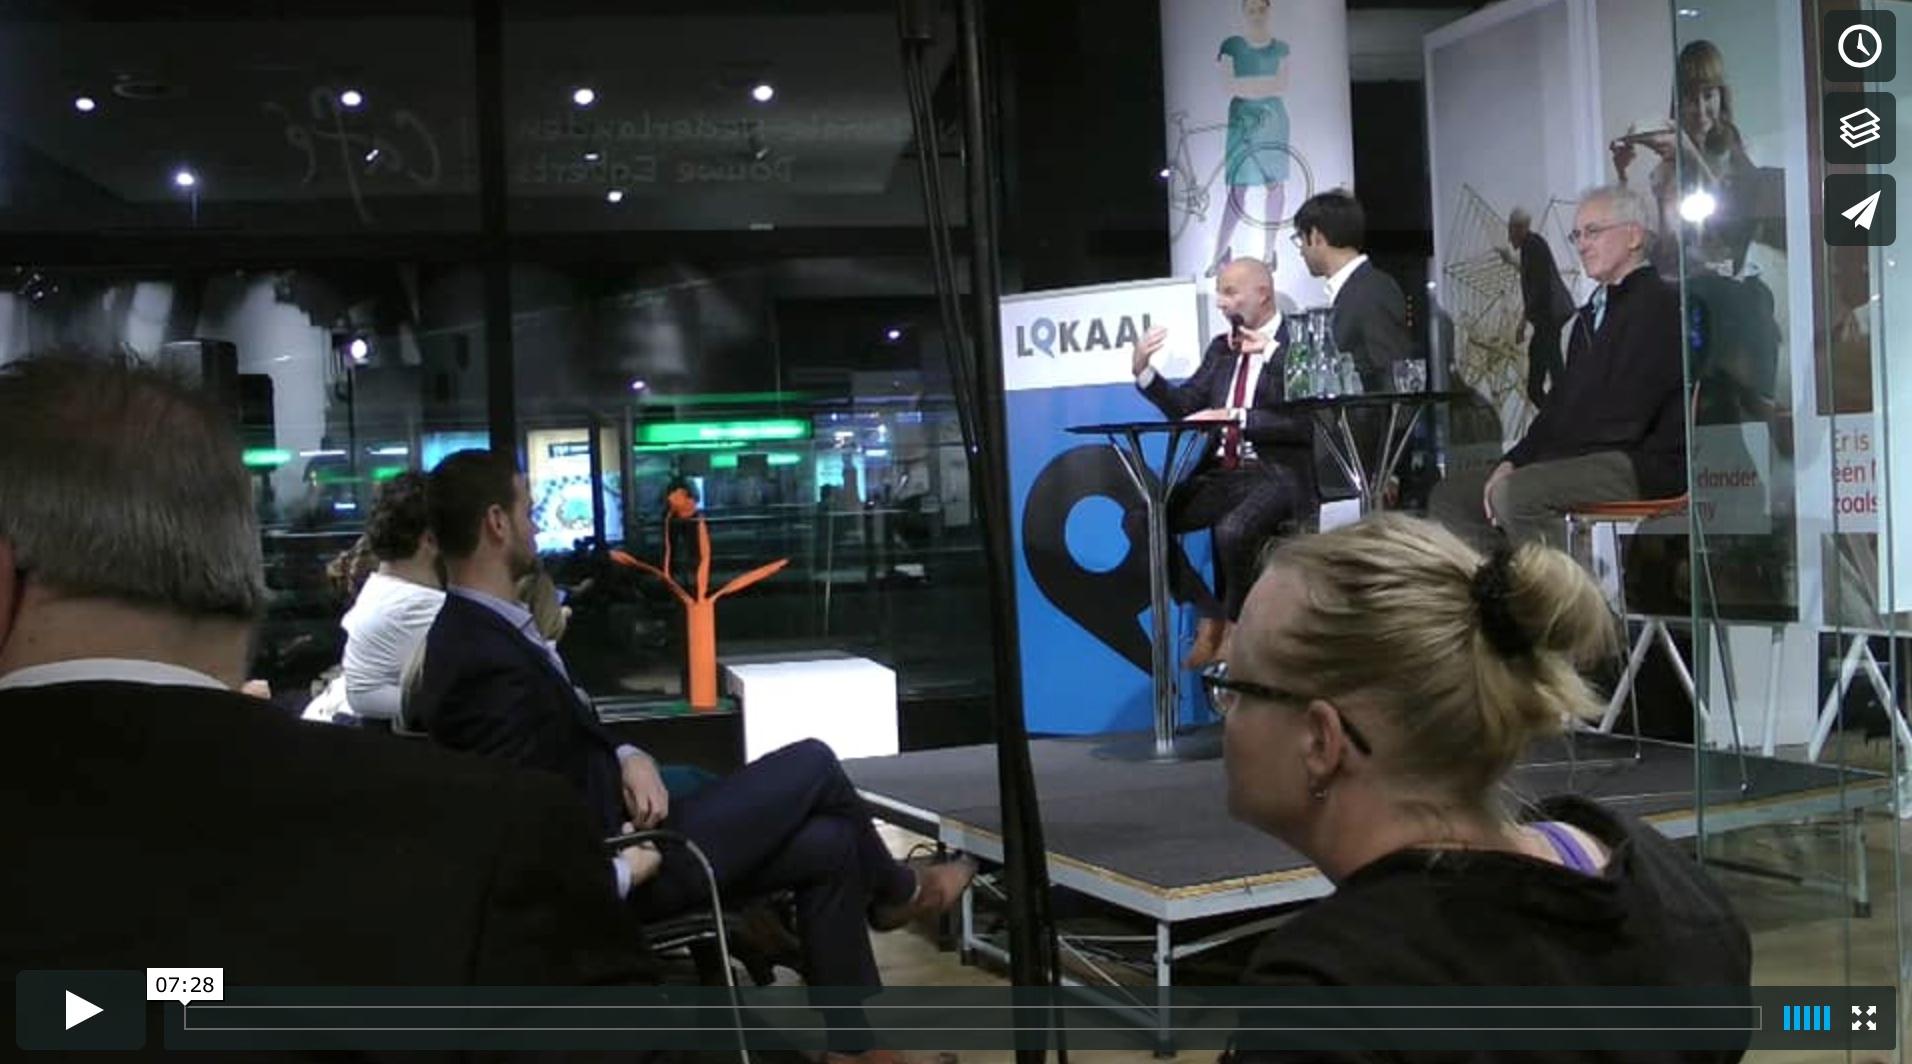 videoverslag: Rotterdam wat vind je er van ?